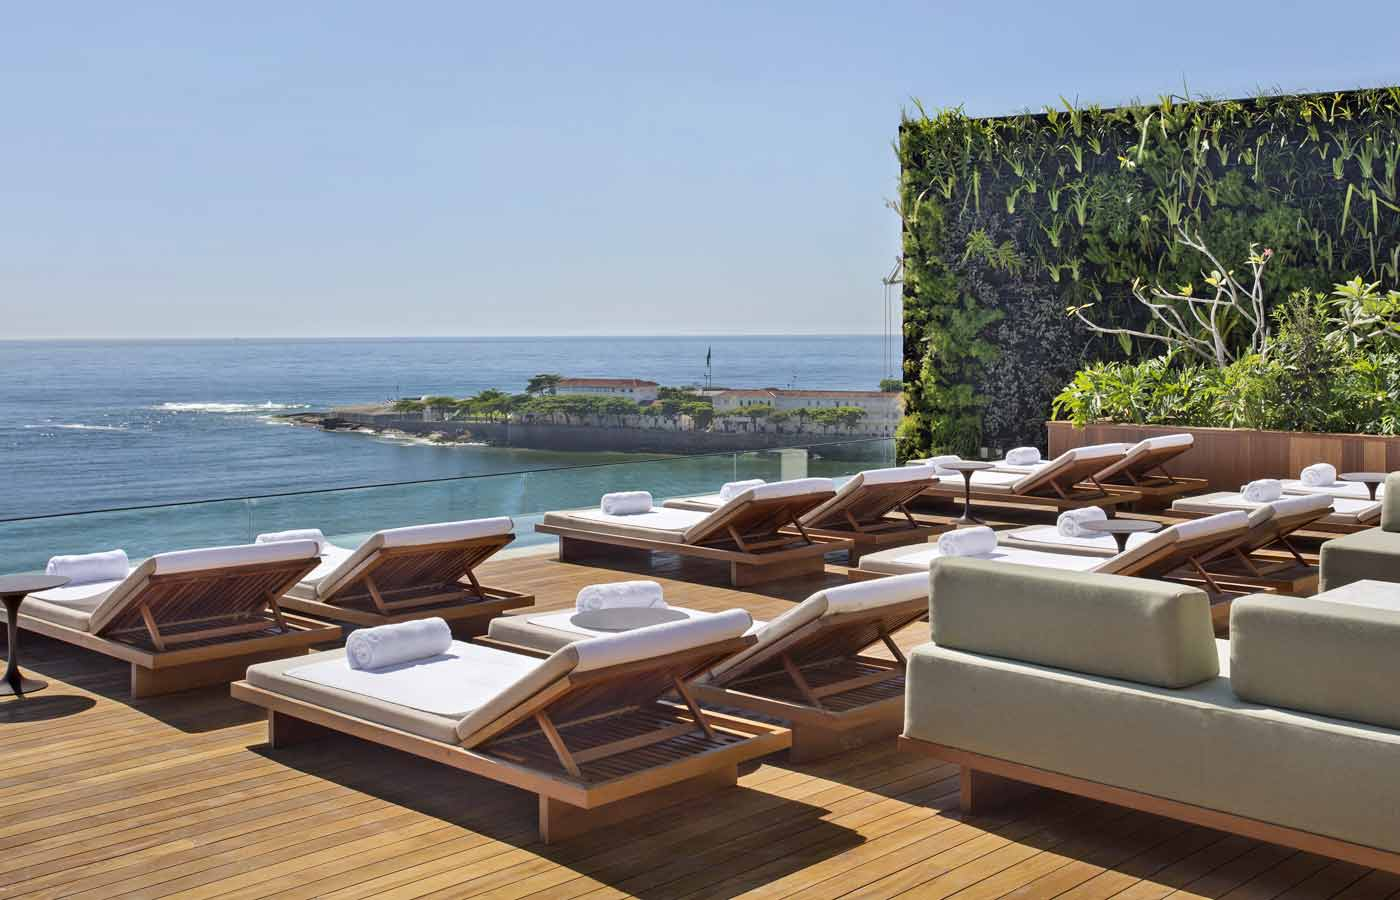 Hotel Emiliano - Luxury holidays to Rio de Janeiro, Brazil